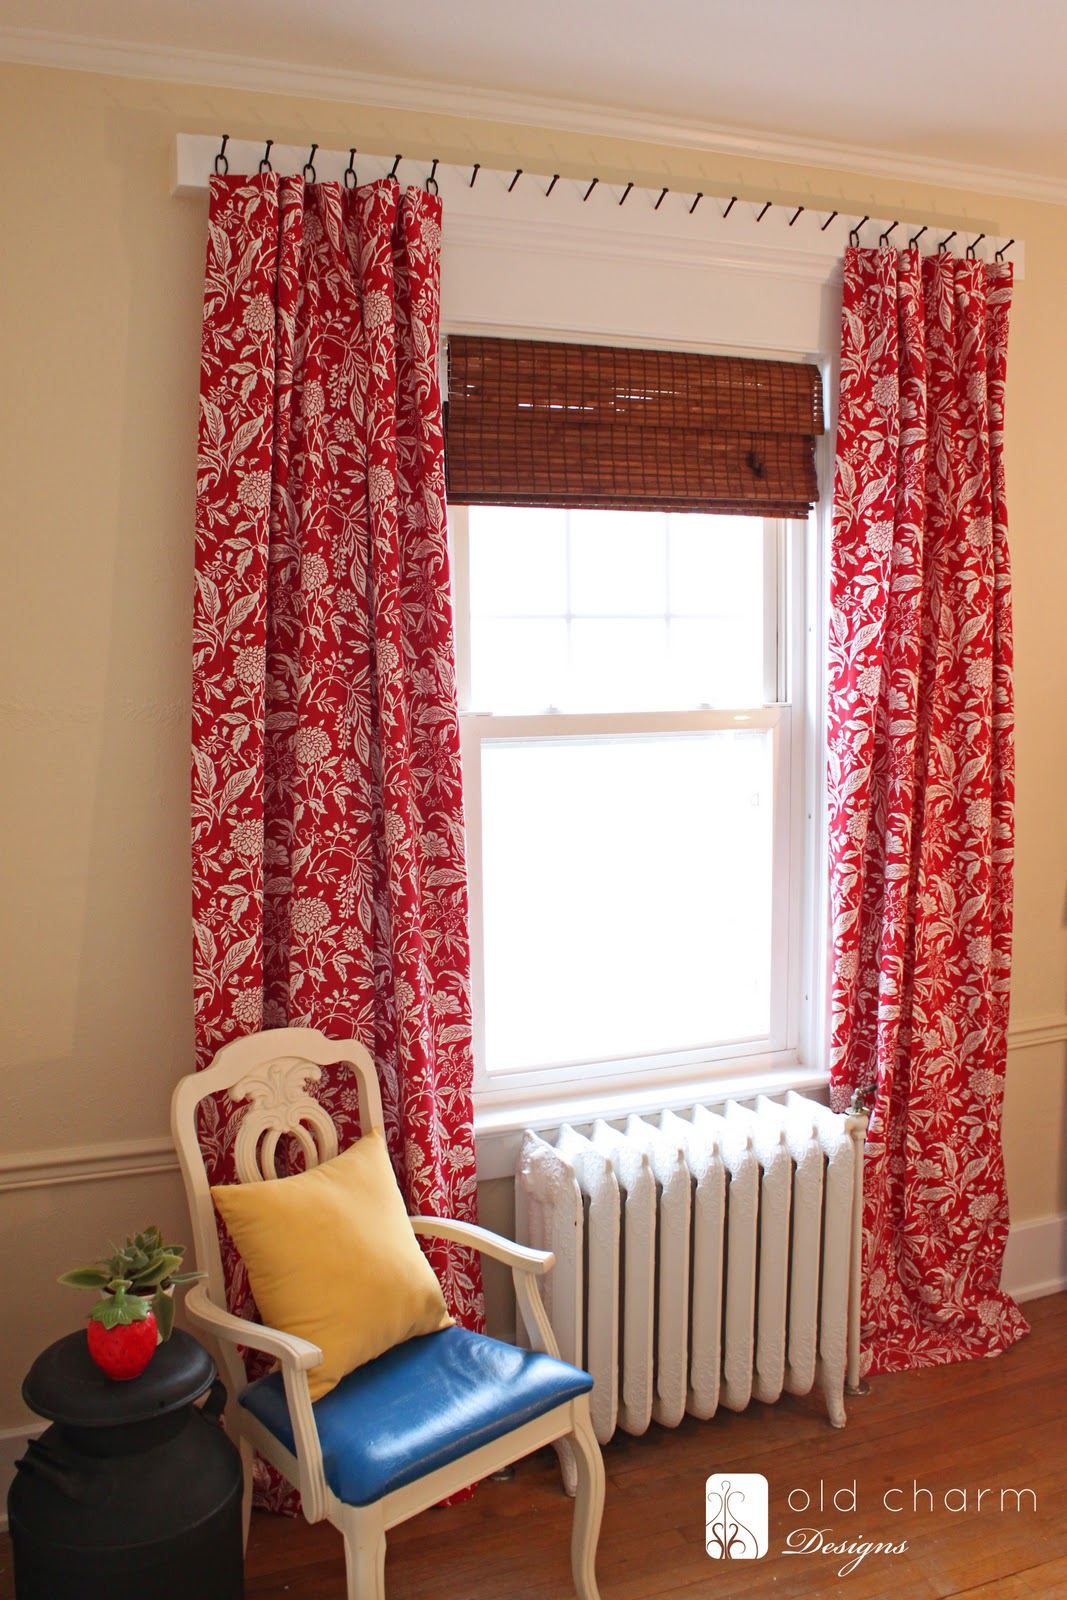 Curtain Drain Installation Drains For Septic System Drape Drapery Hooks